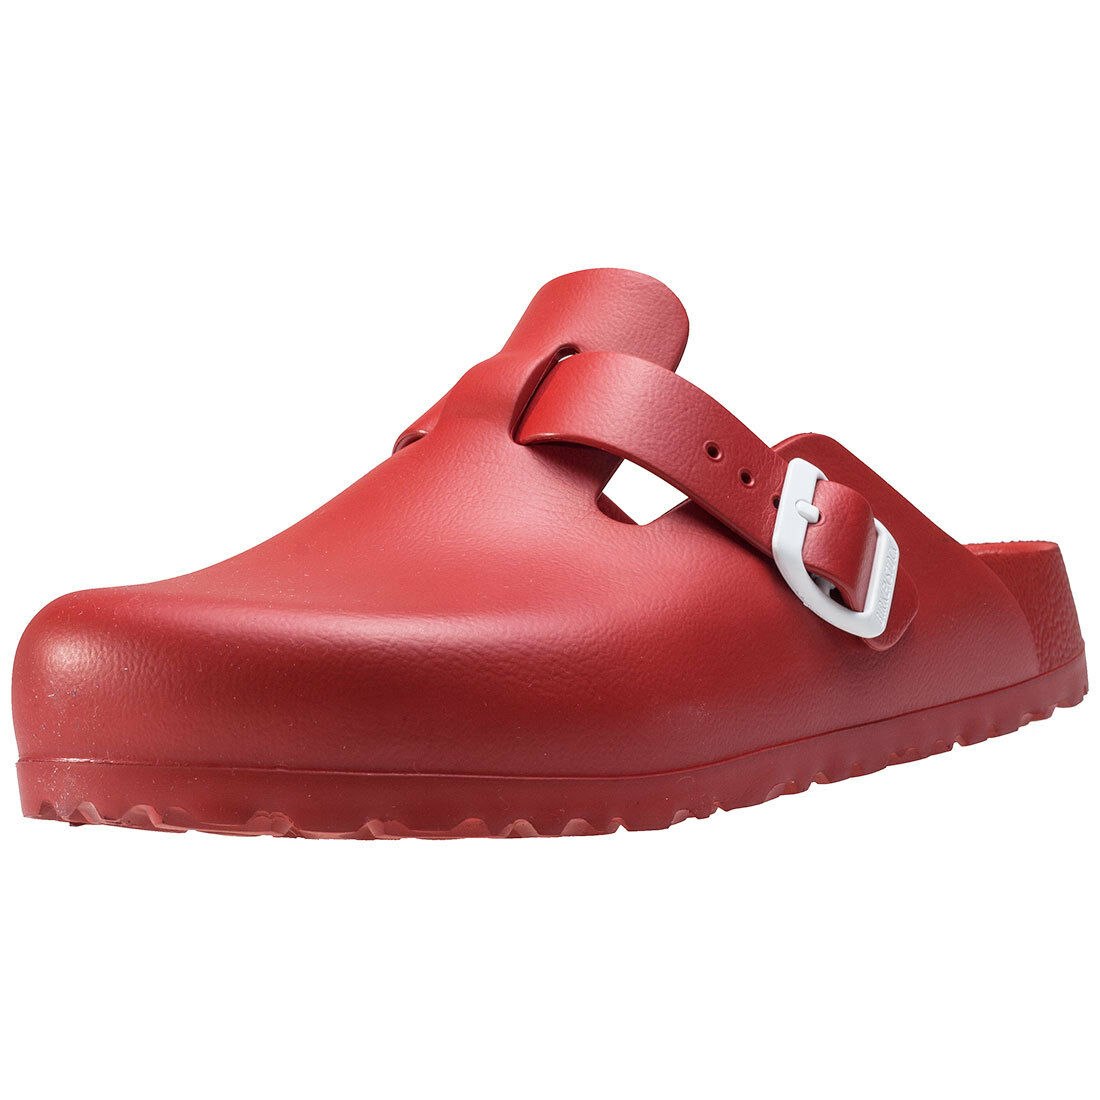 Christian Louboutin Nero Catchetta 35.5- Flat Gladiator Sandals Flat Shoe 35.5- Catchetta 5.5 583015